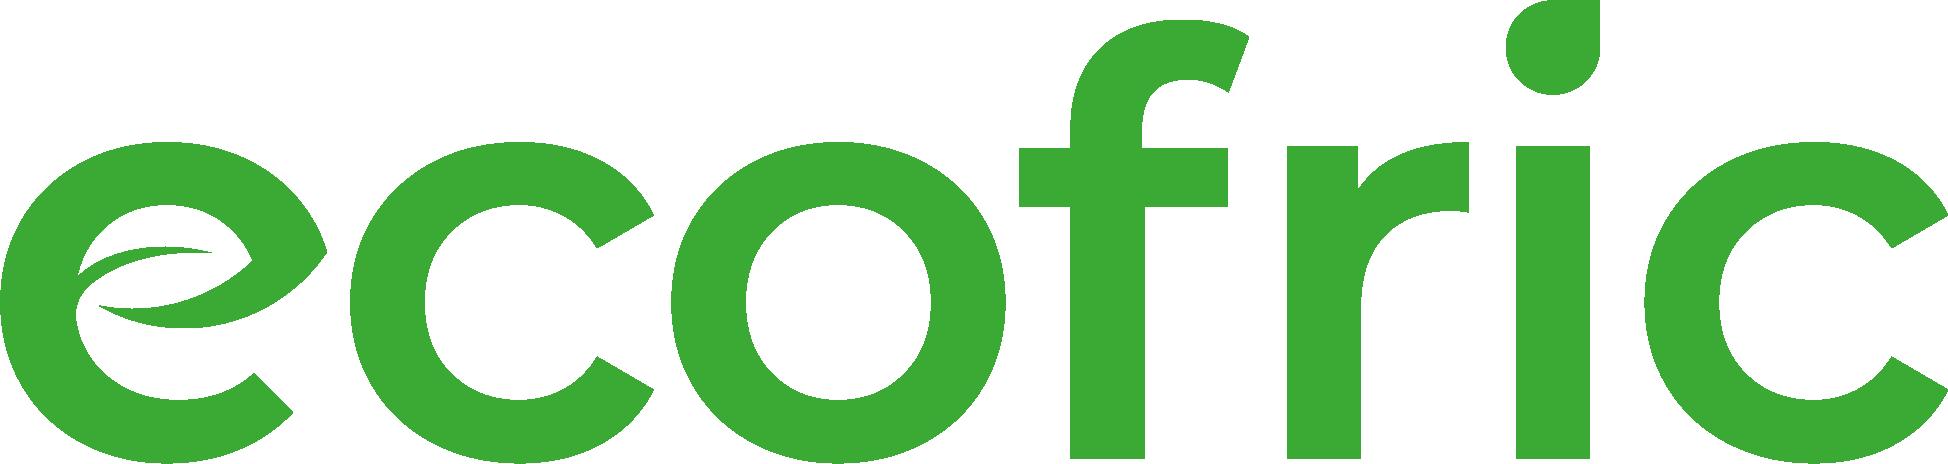 Ecofric's logo.